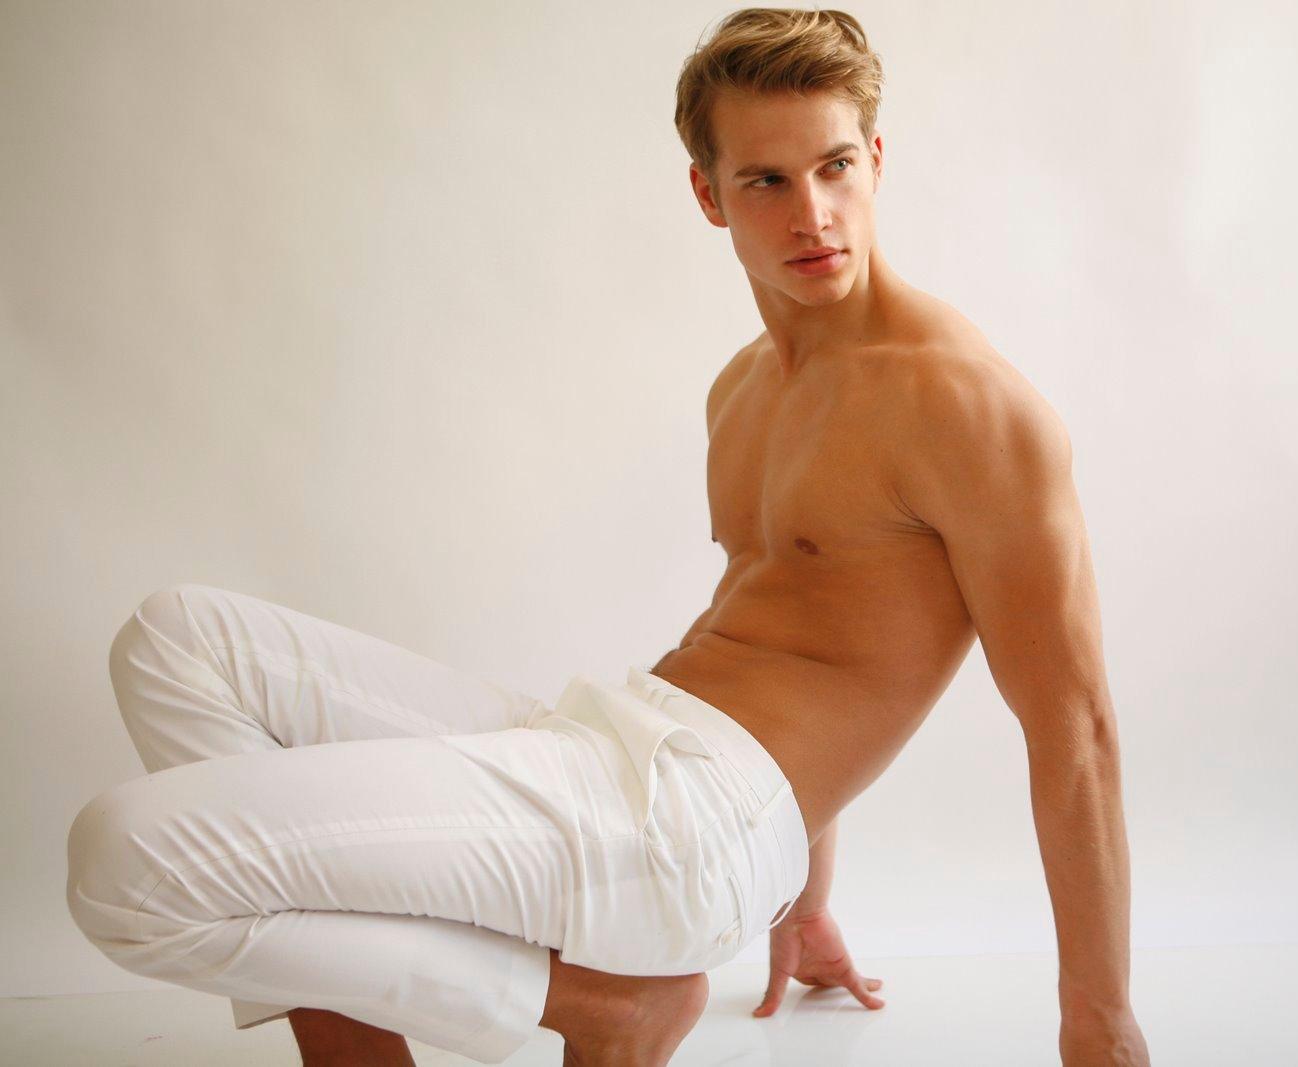 Shirtless gay twinks in shorts movies jason 8